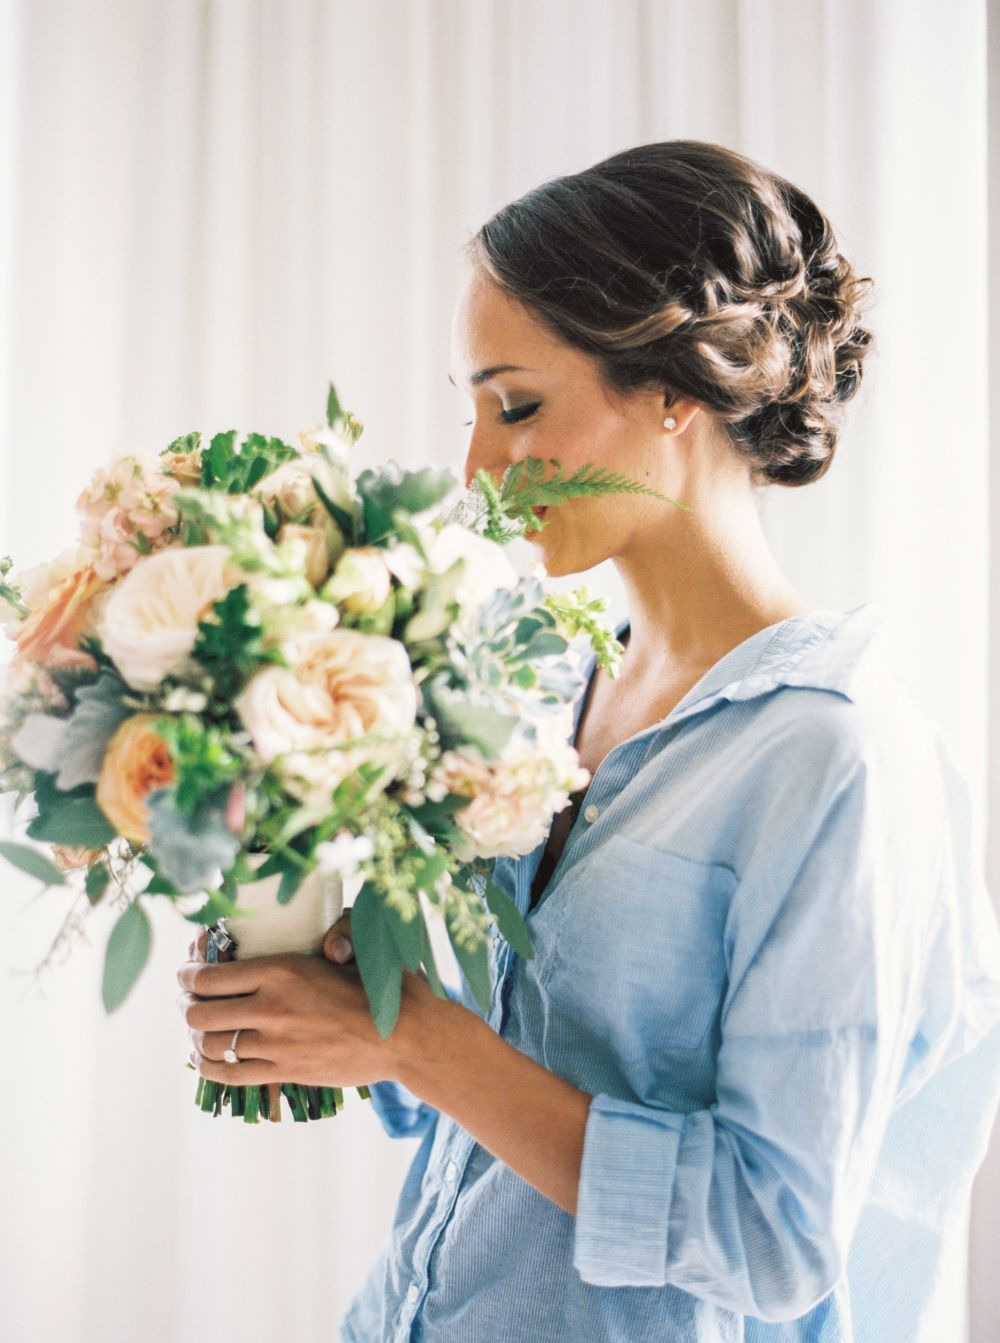 Getting ready wedding vintage weddings weddings and wedding wedding dress ombrellifo Image collections